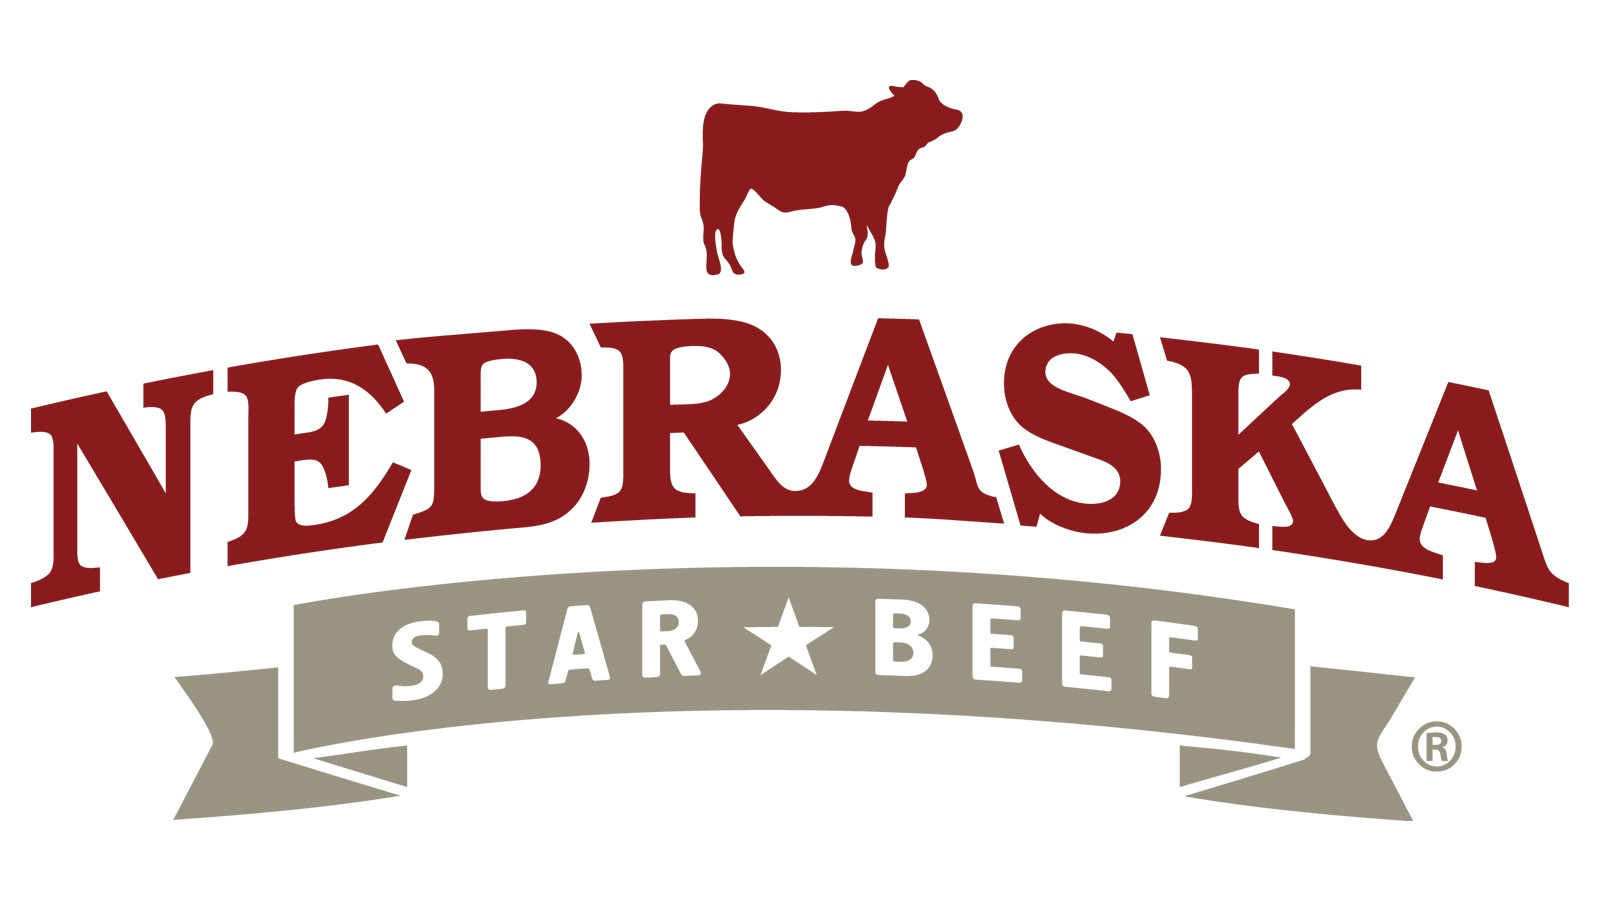 Beef from Nebraska